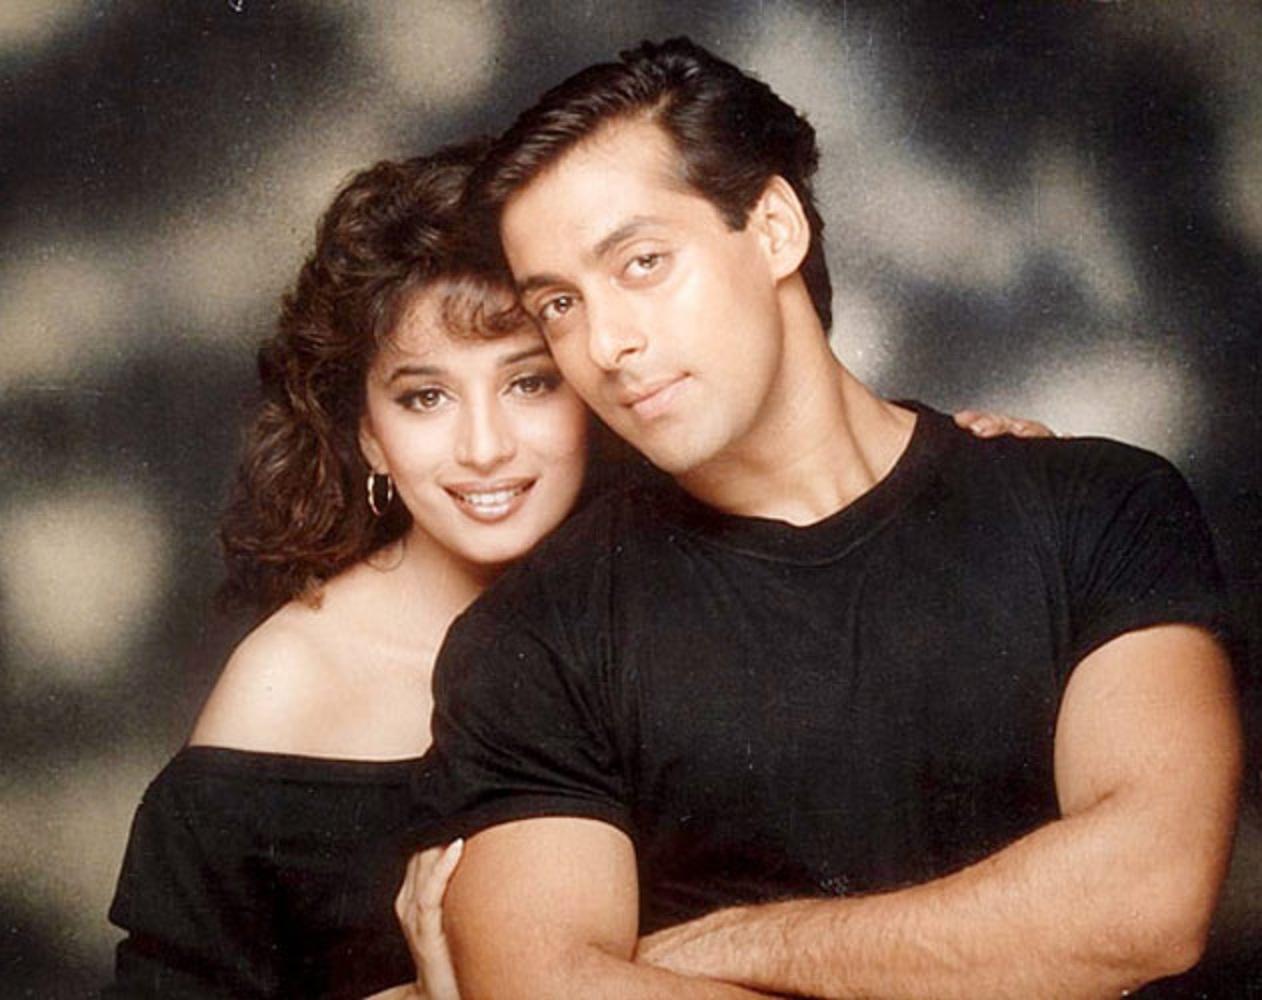 Beautiful Copule Madhuri Dixit And Salman Khan Wallpaper Beautiful